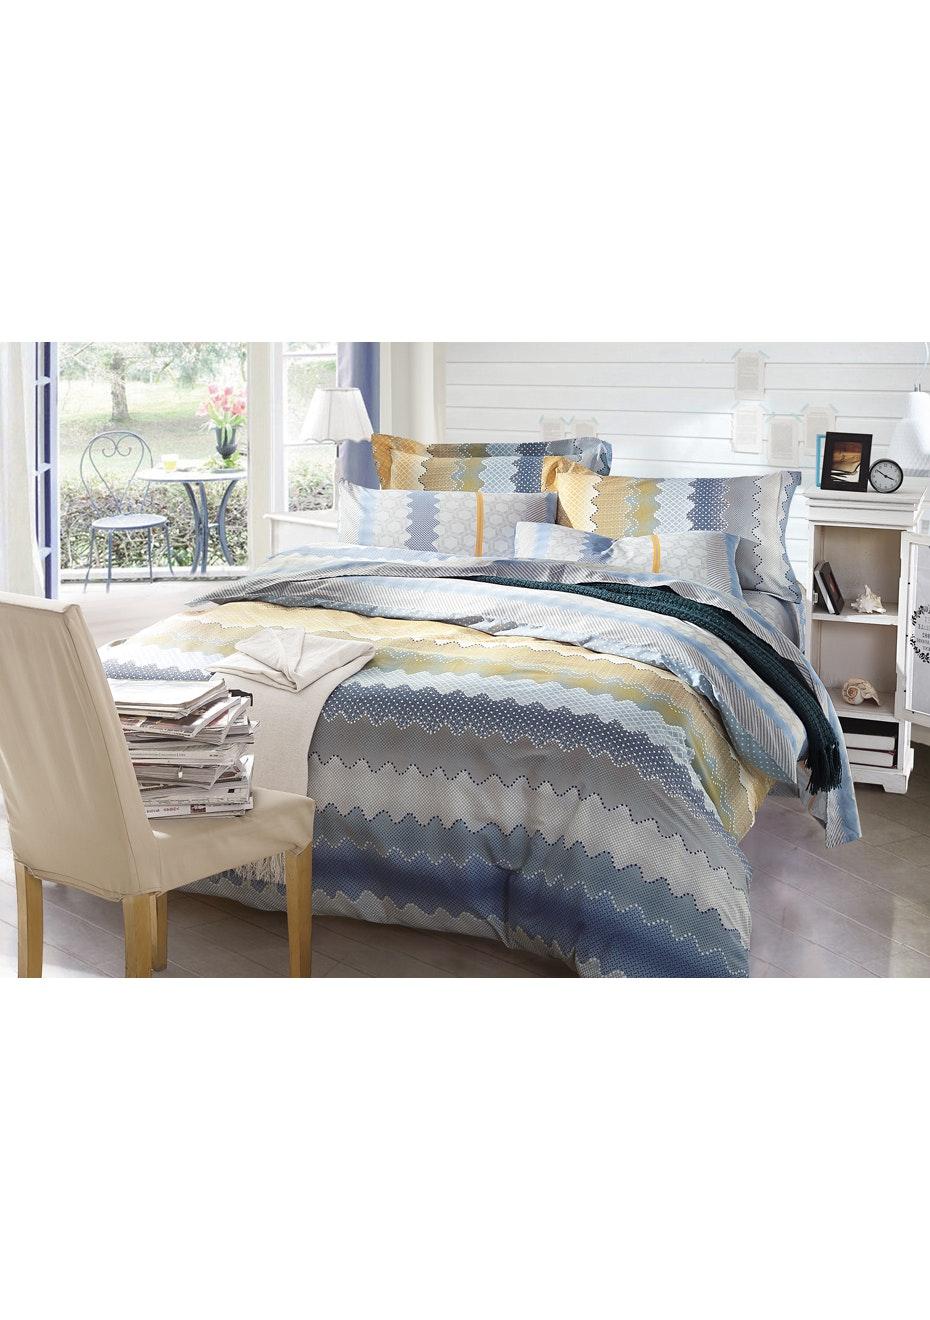 Harper Quilt Cover Set - Reversible Design - 100% Cotton Single Bed